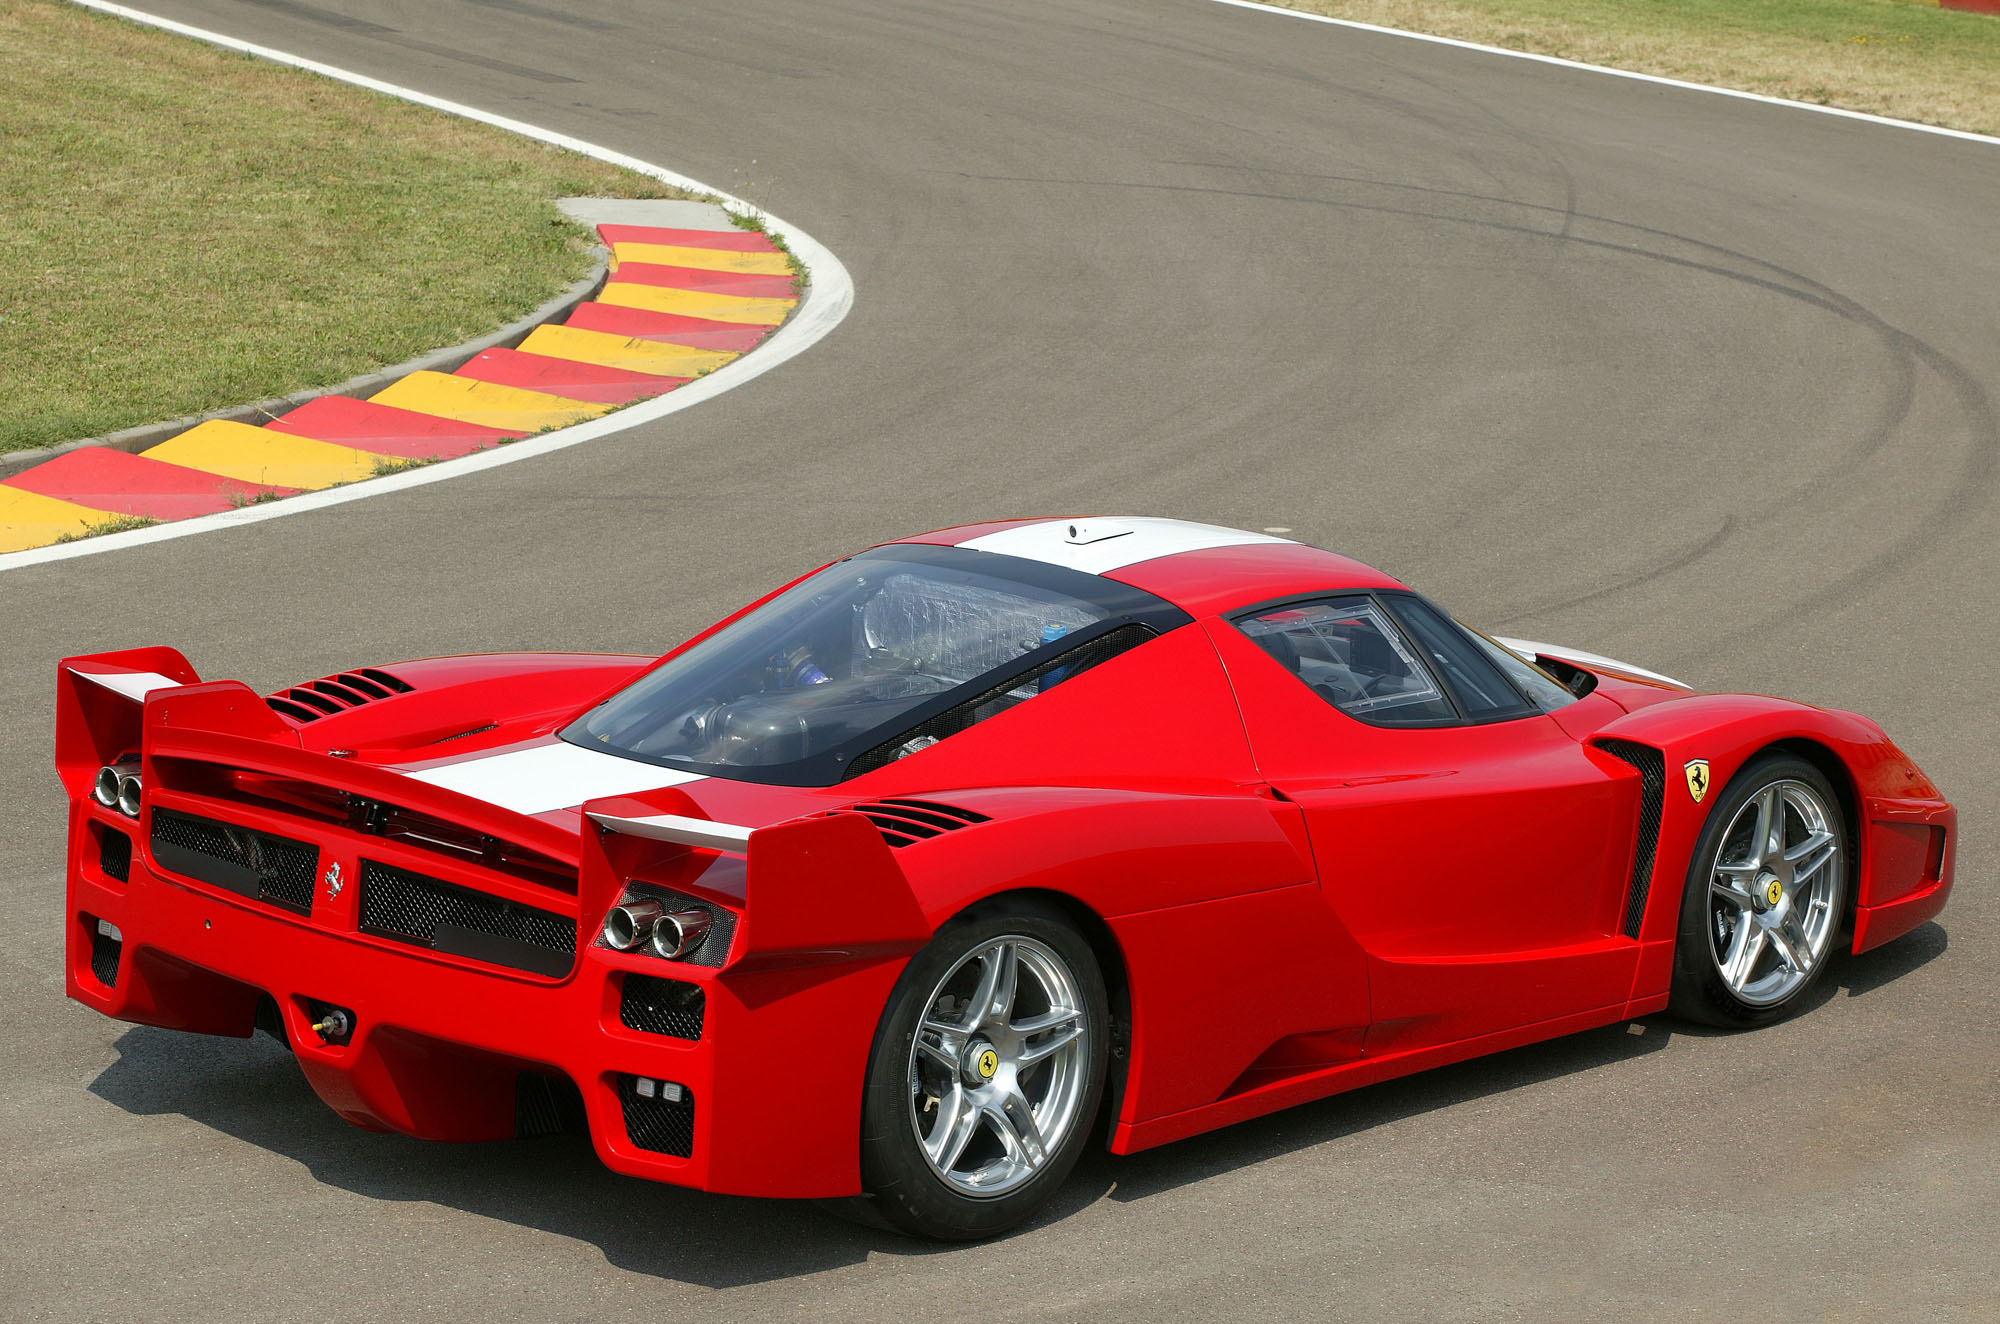 Ferrari Fxx Evolution Lego Speed Build